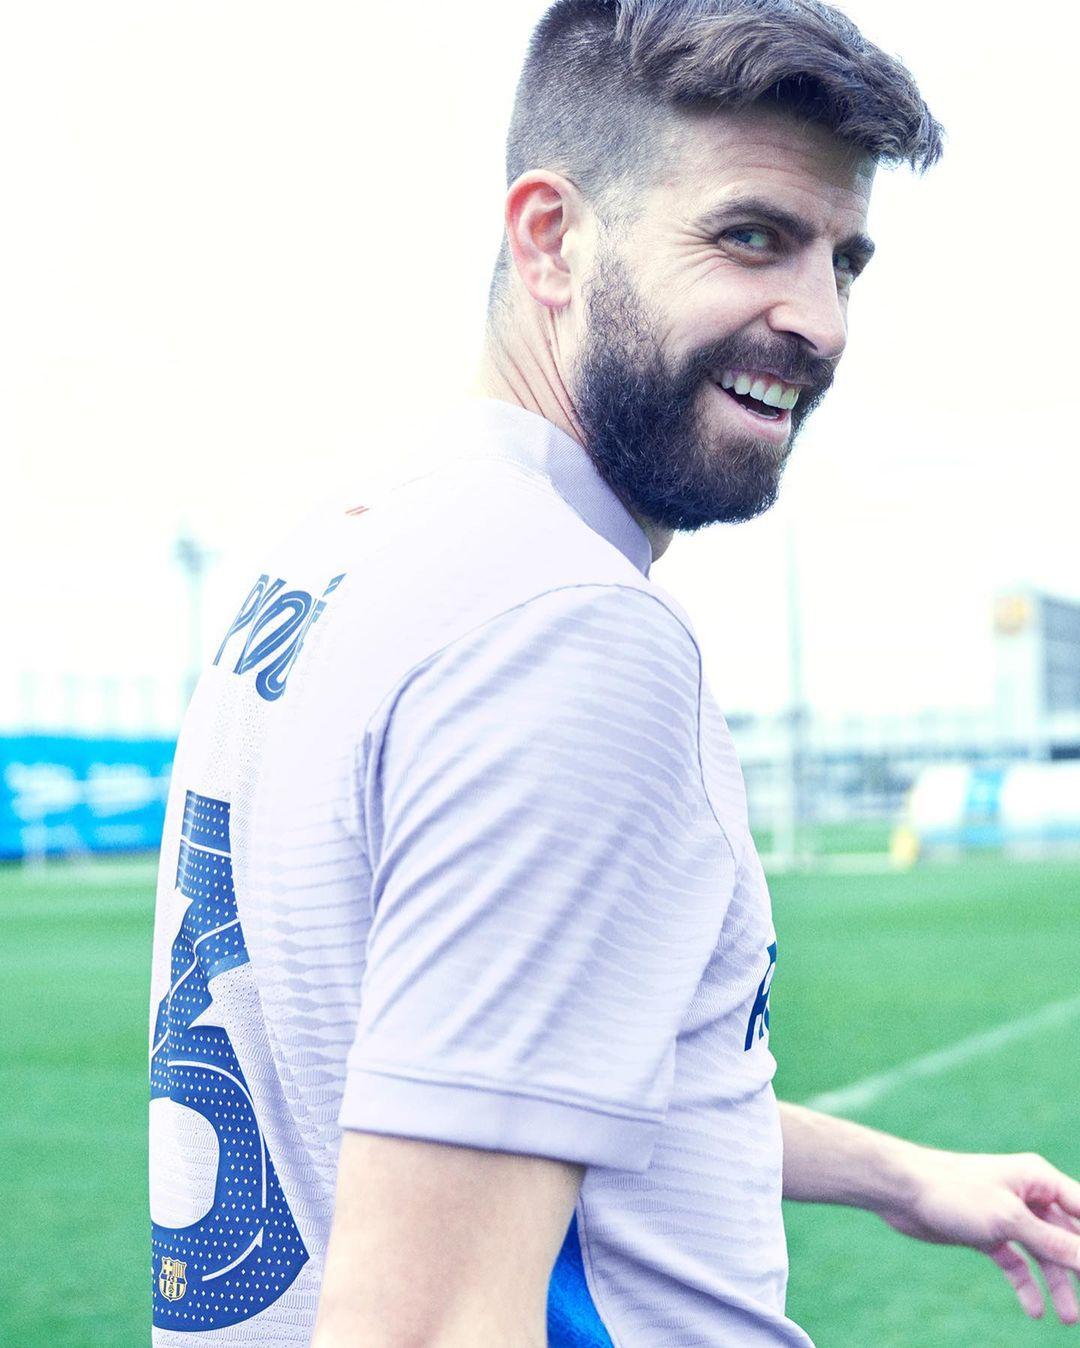 FC Barcelone 2022 maillot exterieur foot Pique